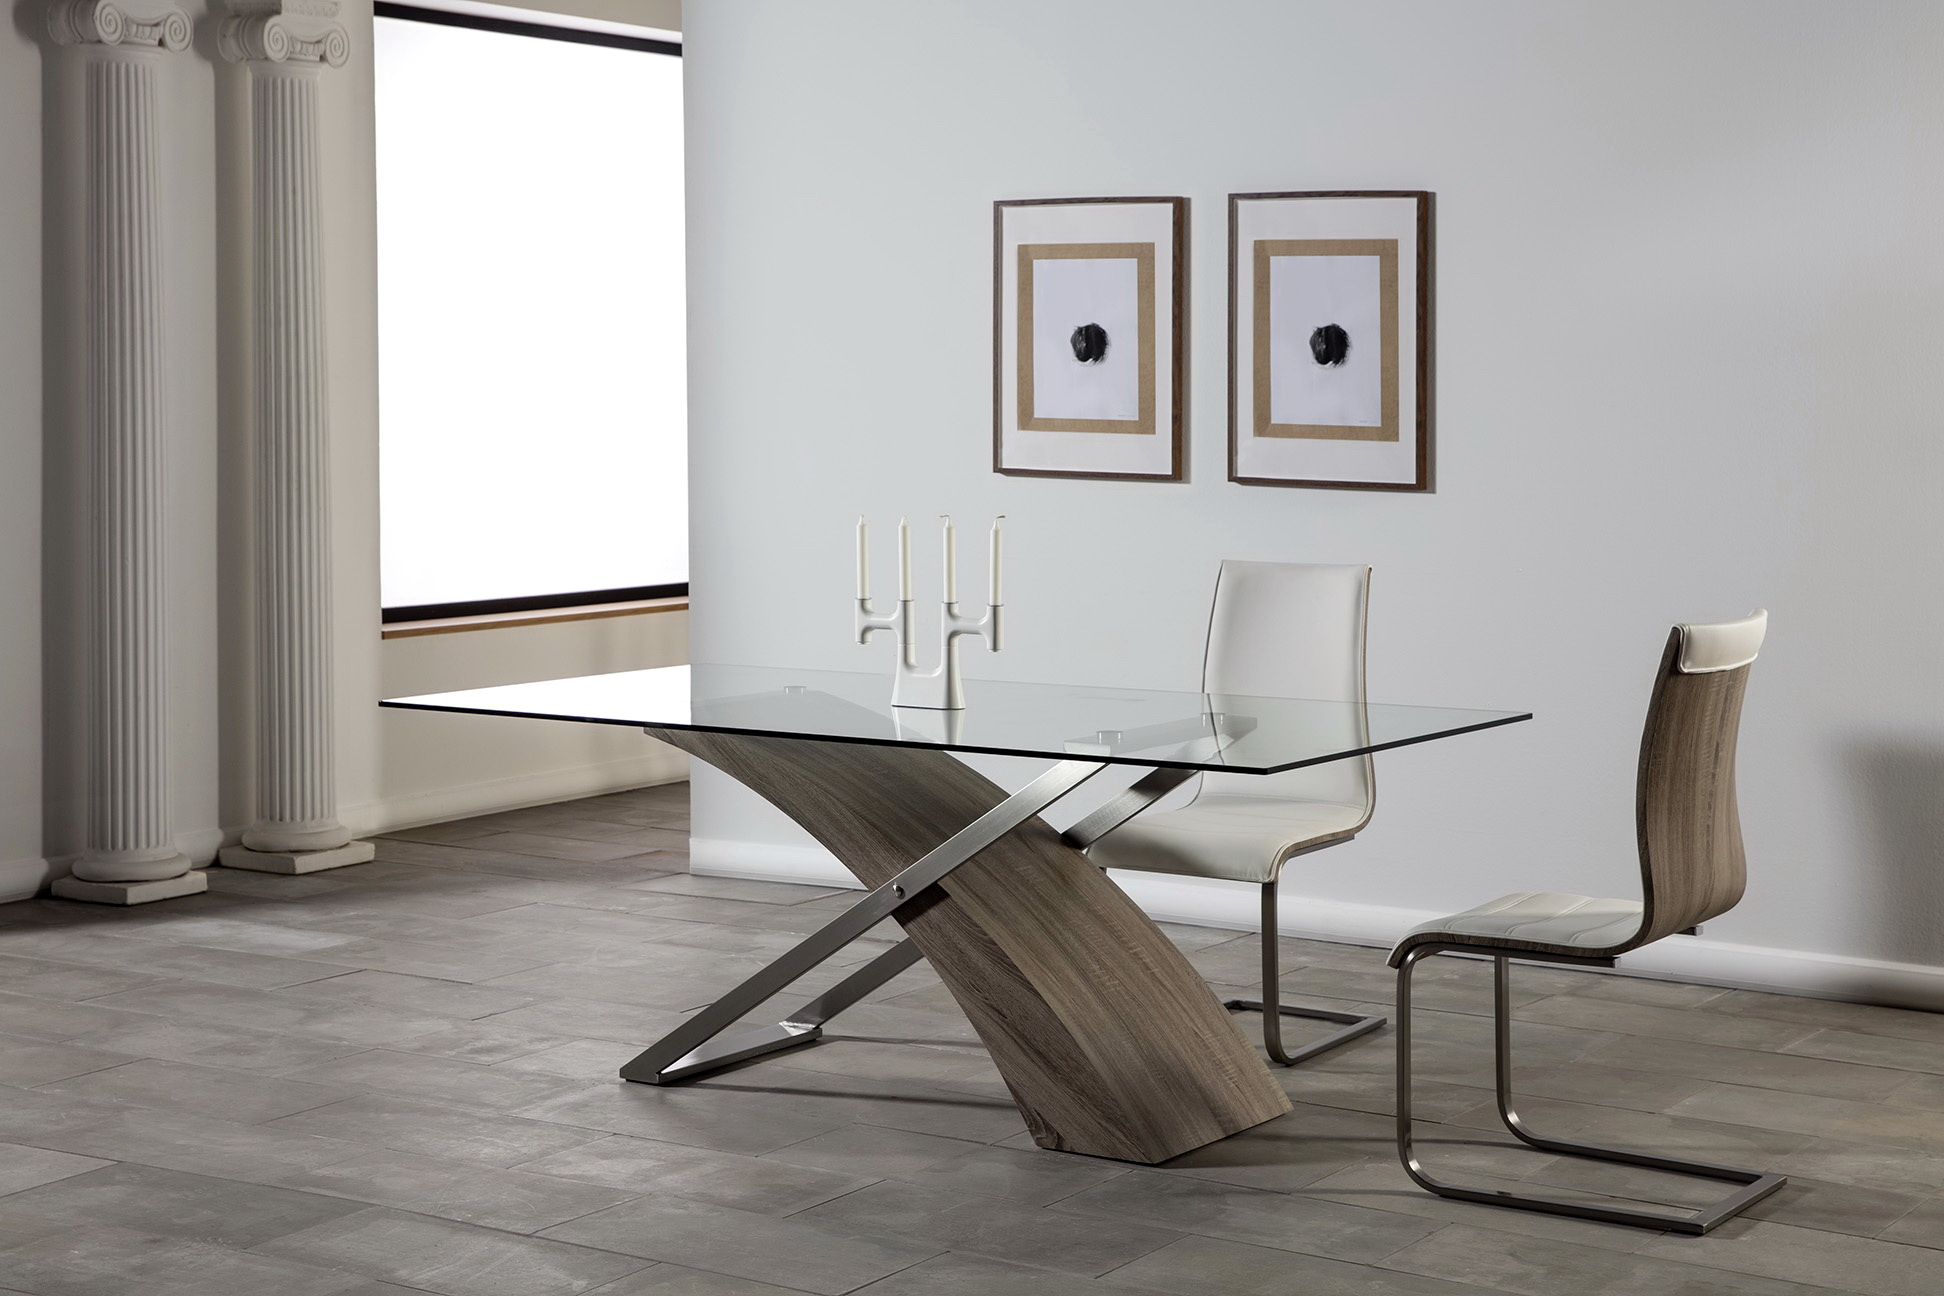 MESA RECT. ARAMIS 200x100cm ROBLE GRIS i-5582-r5.1 by Marckeric en muebles antoñán® León